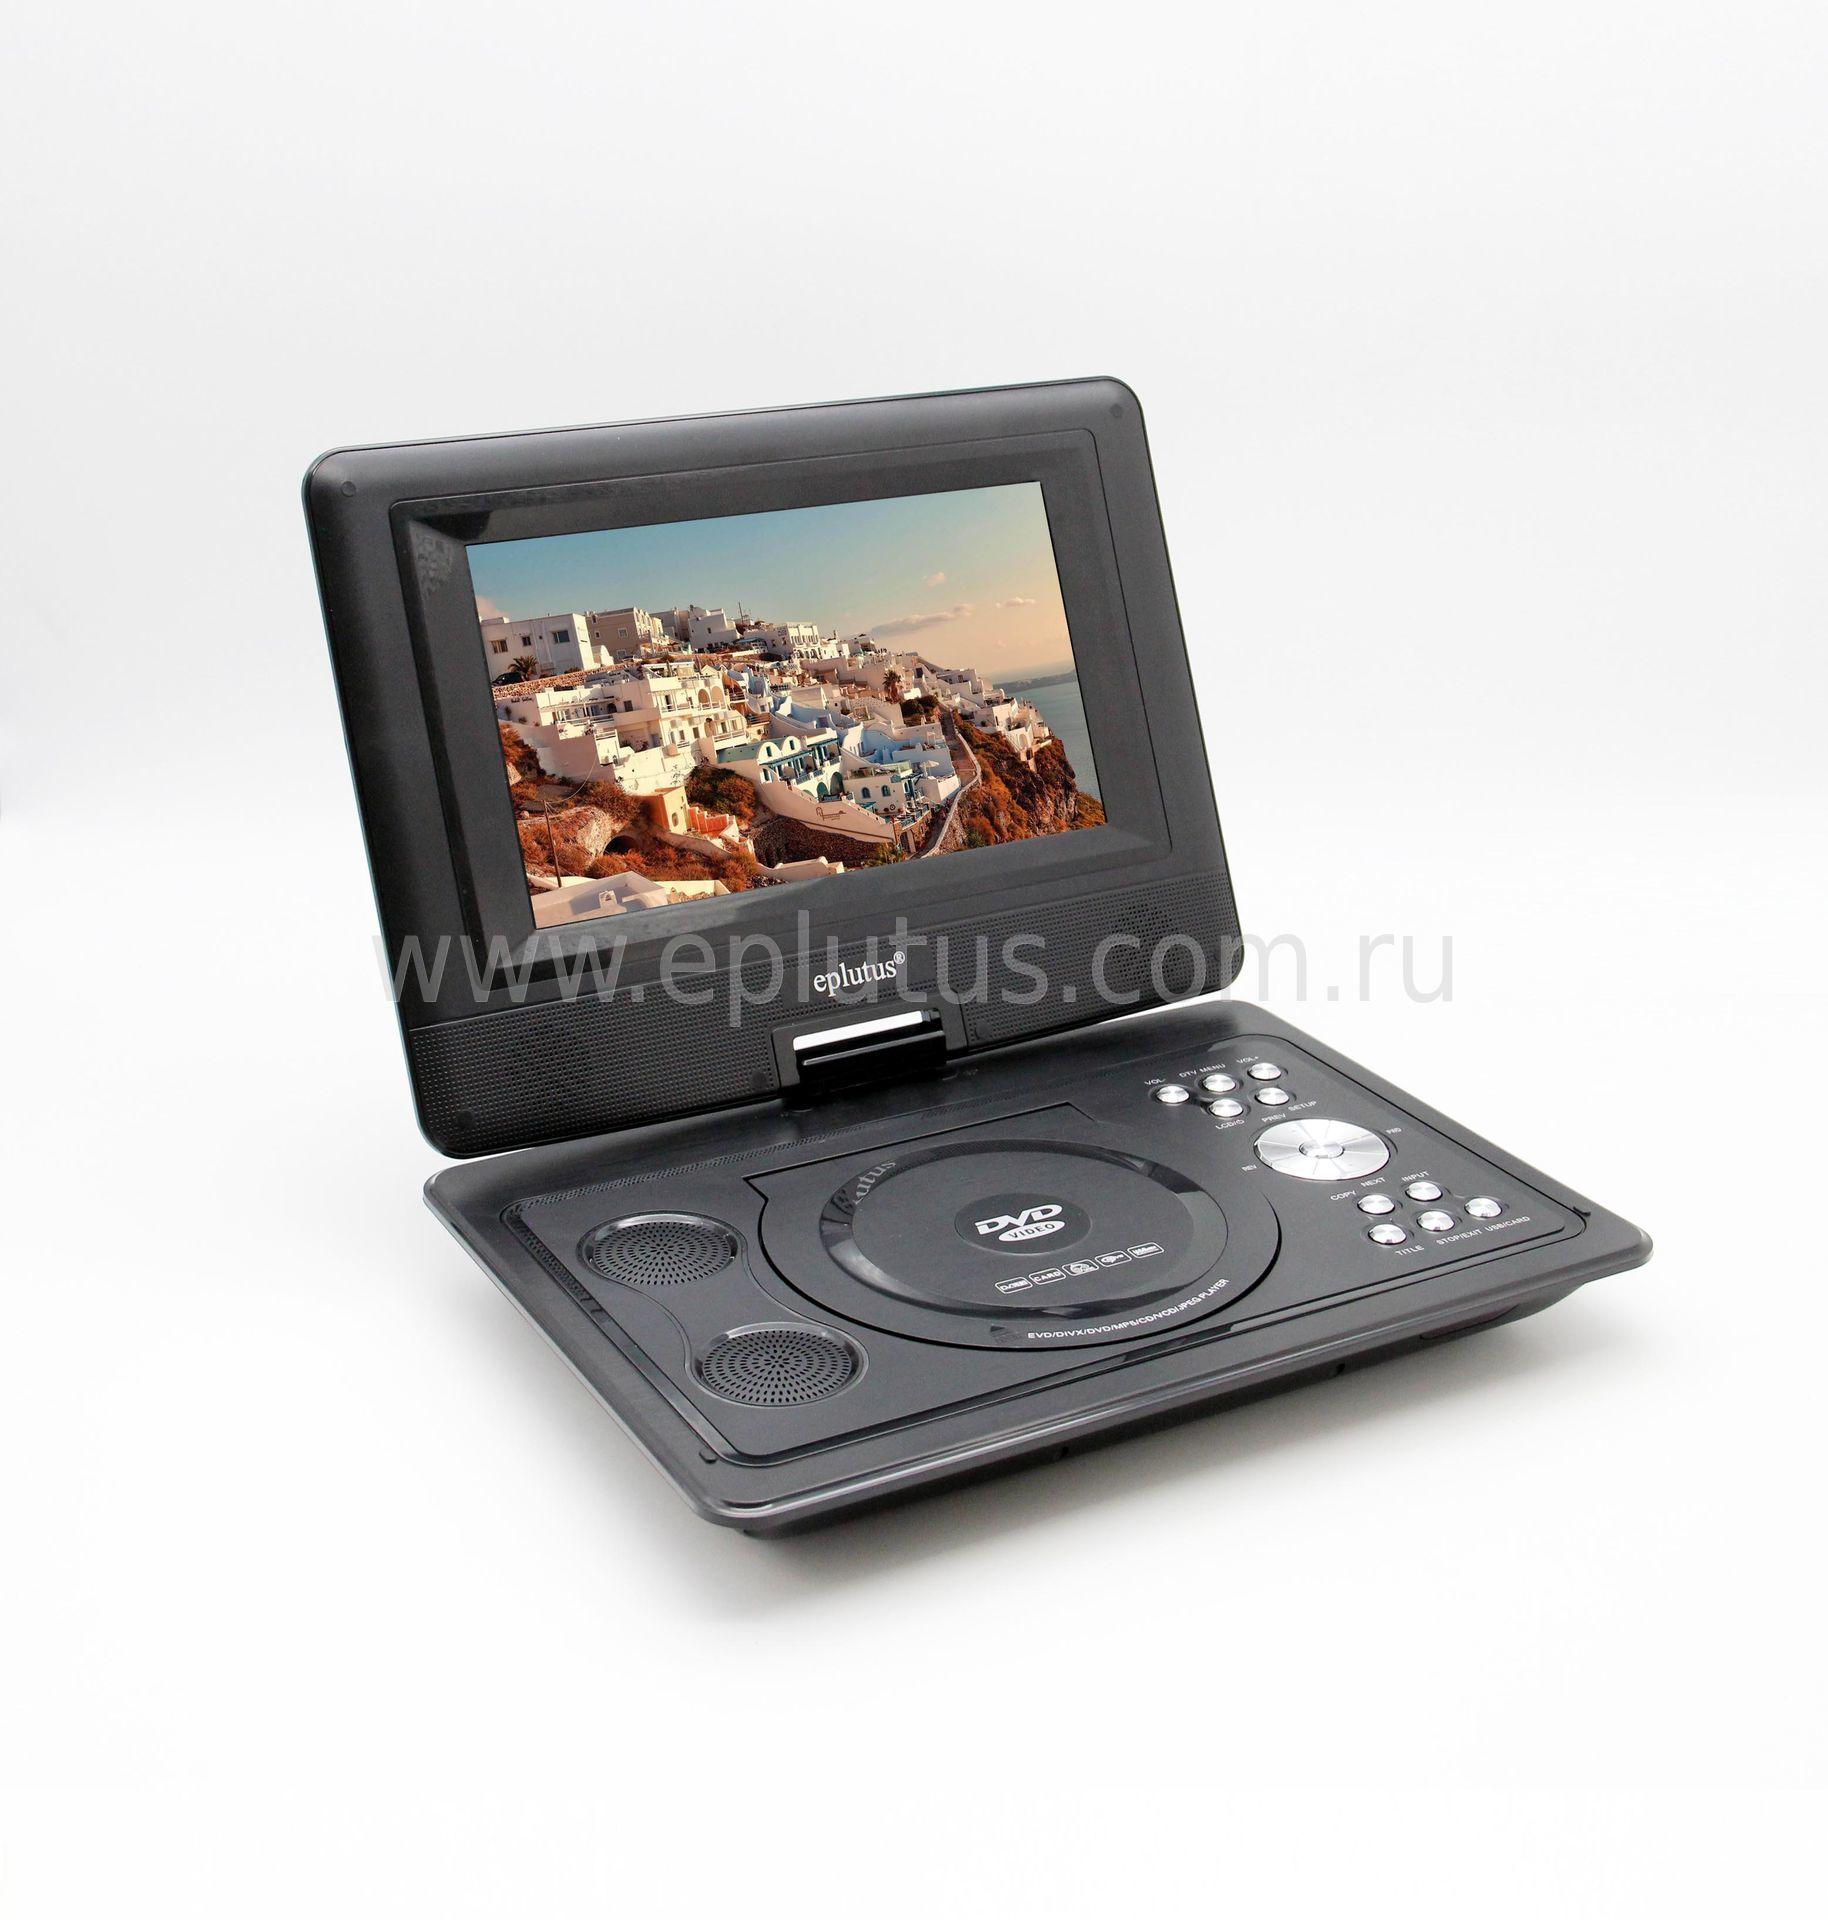 Eplutus EP-9521T dvd плеер malata pdvd 830 проигрыватель cd проигрывателей qiaohu vcd проигрыватель dvd проигрывателя usb плеер черный